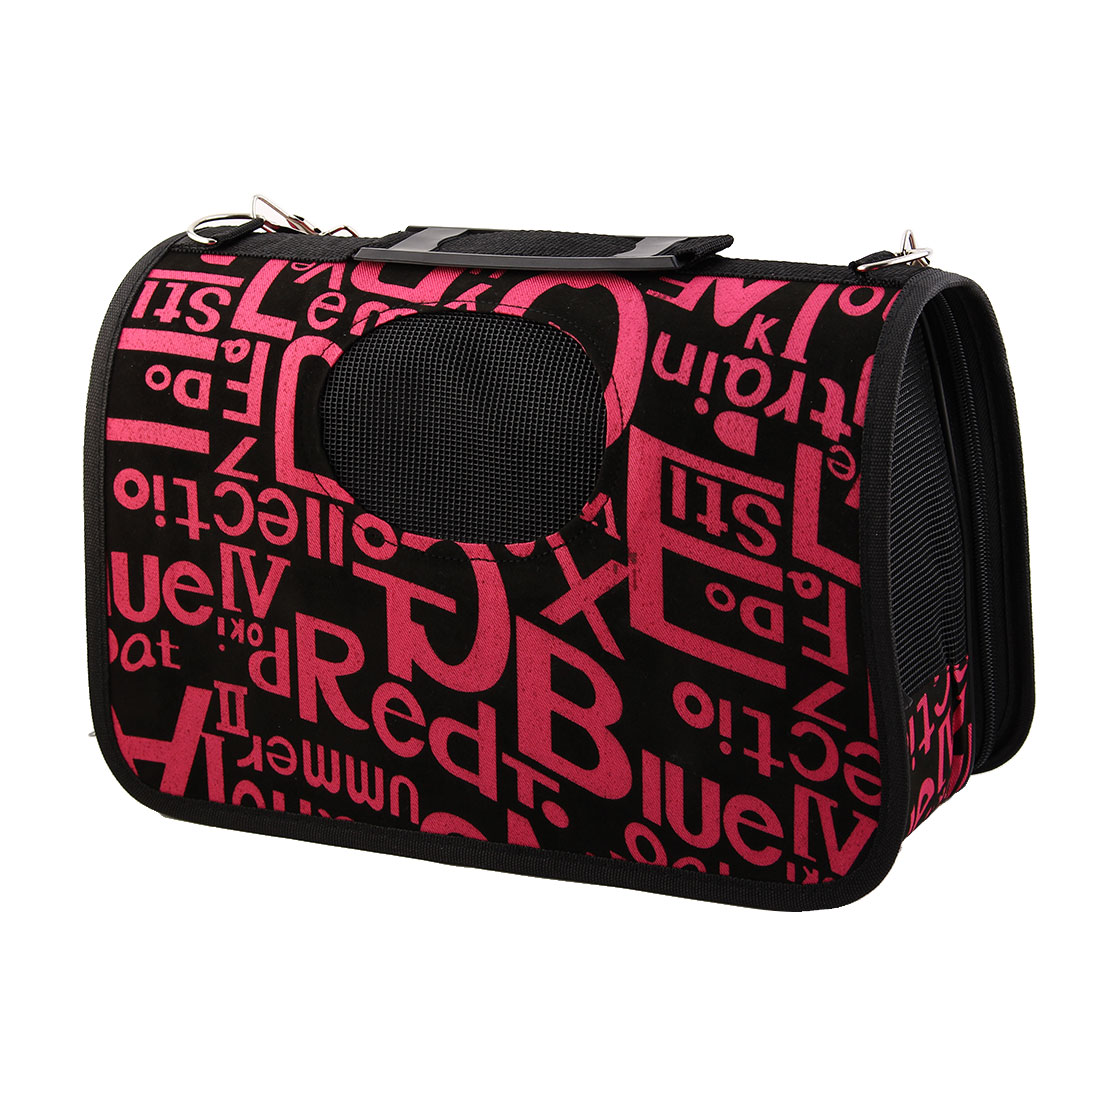 Outdoors Nylon Letter Print Meshy Zipper Closure Pet Carrier Dog Cat Handbag Bag